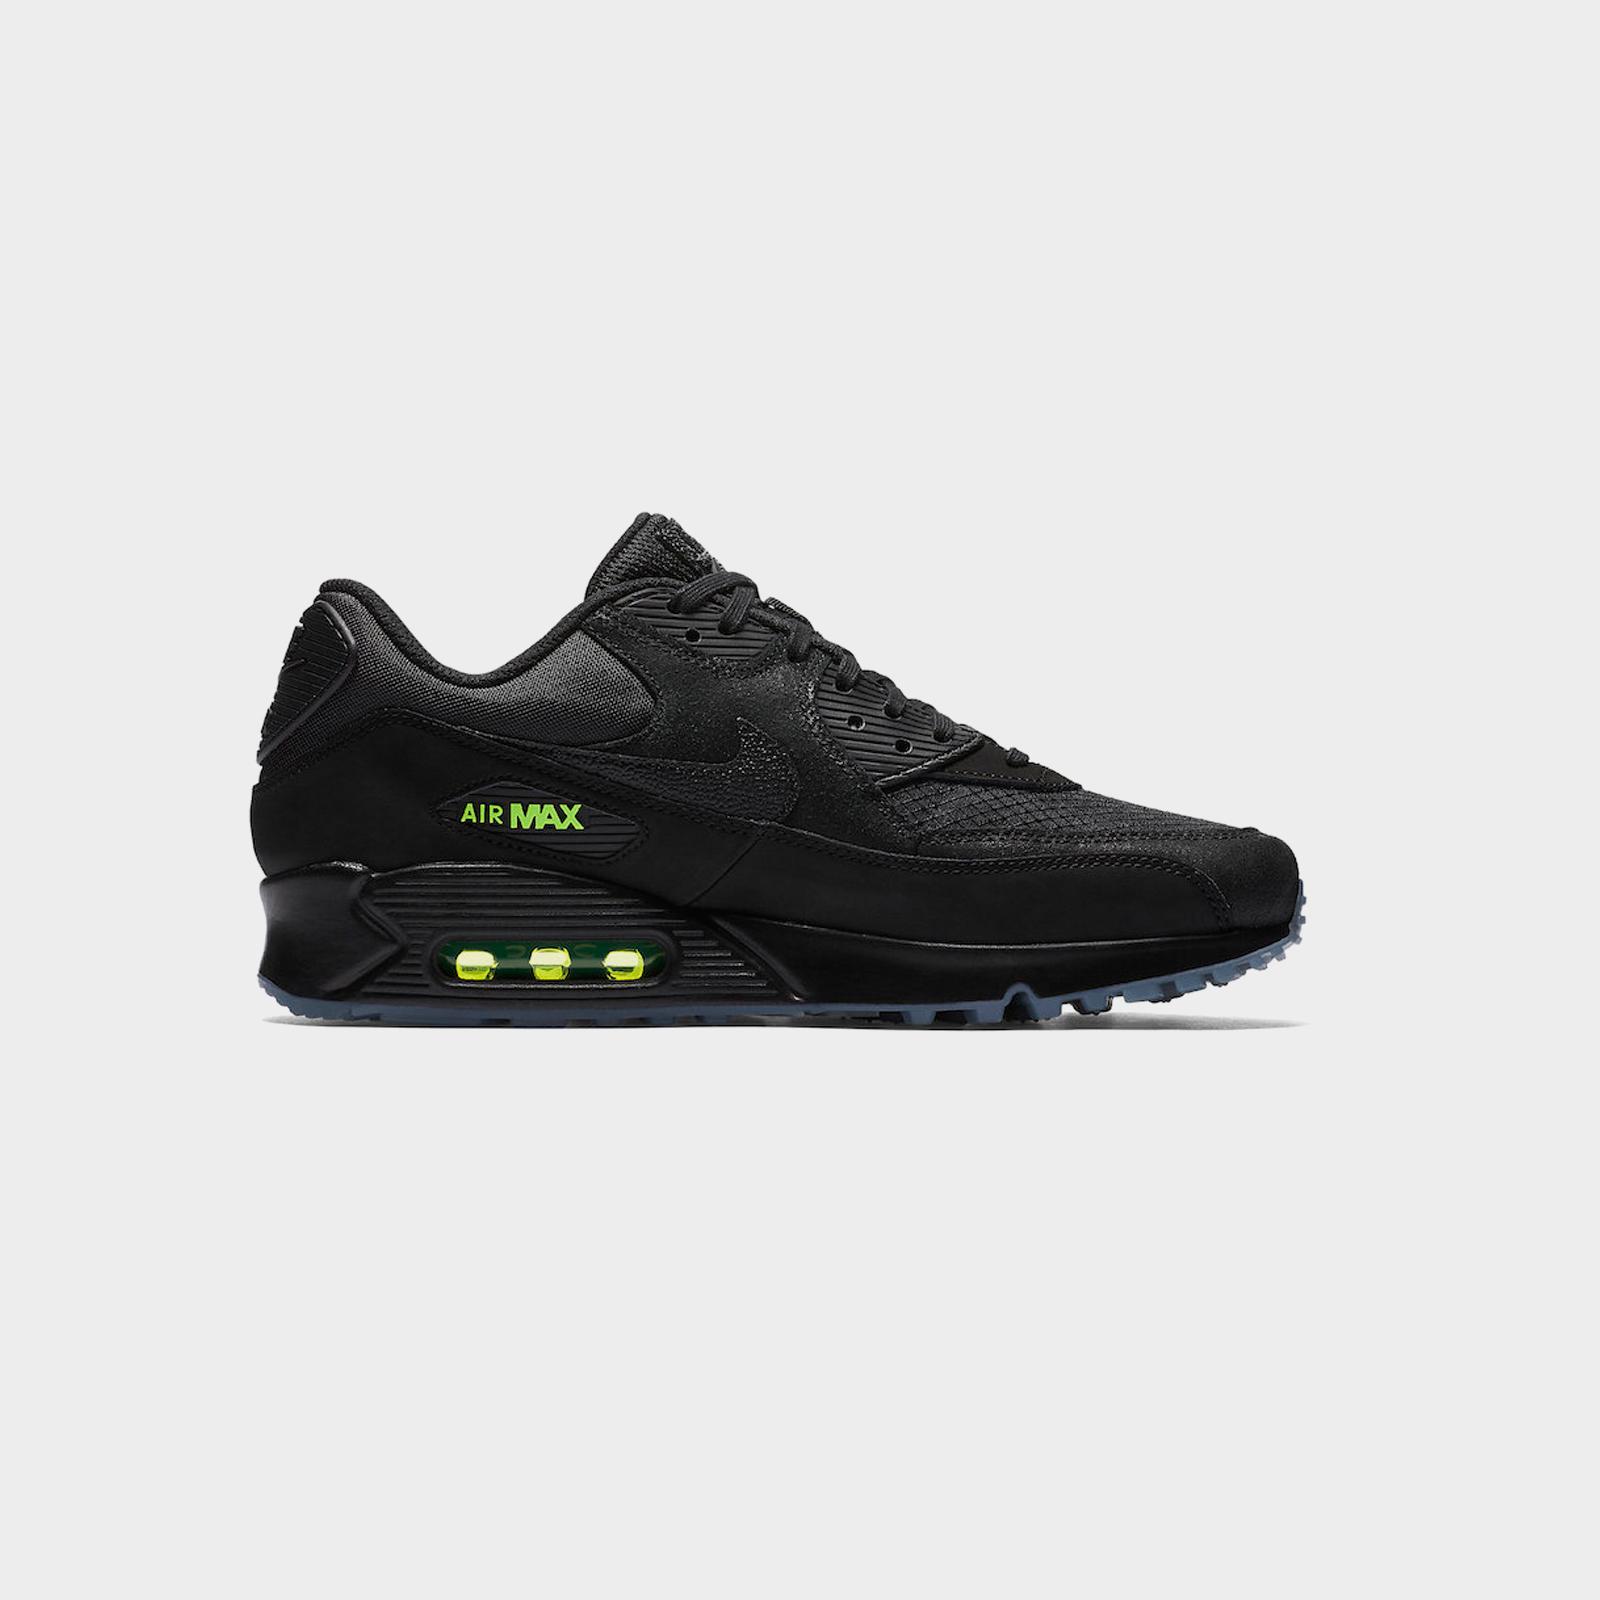 best website 0fc81 72faf Nike Air Max Jordan Fusion